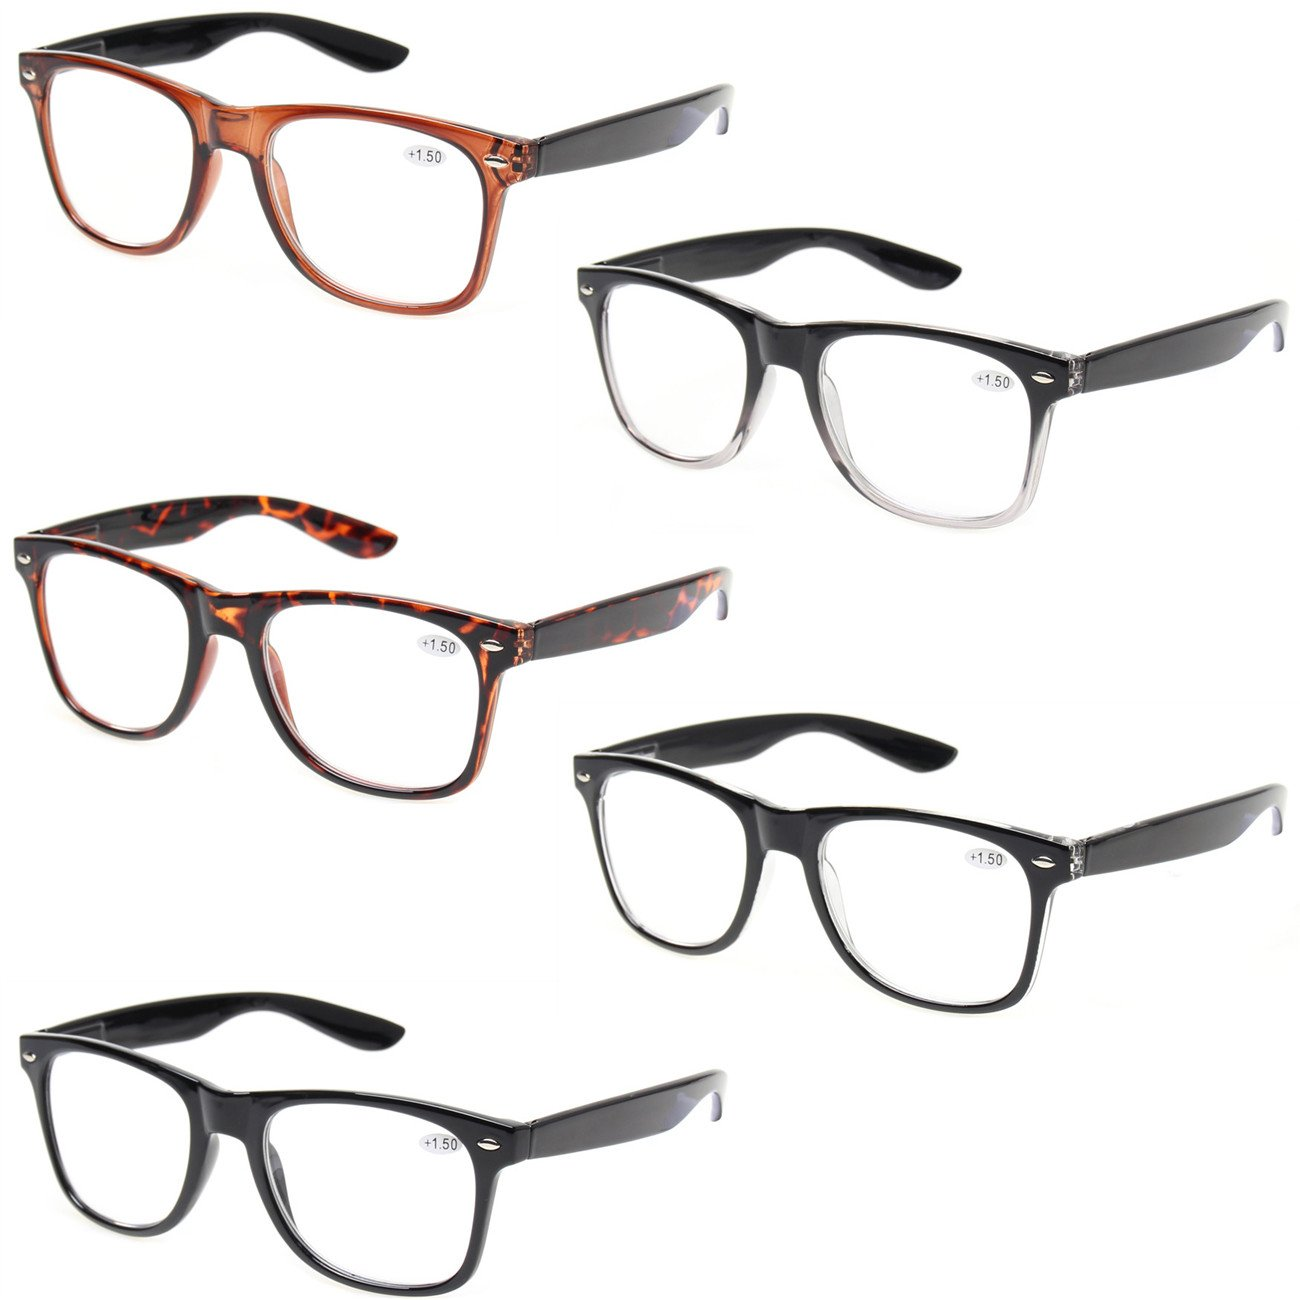 e23b60140a7 Reading Glasses 5 Pack Spring Hinge Large Frame Fashion Men and ...